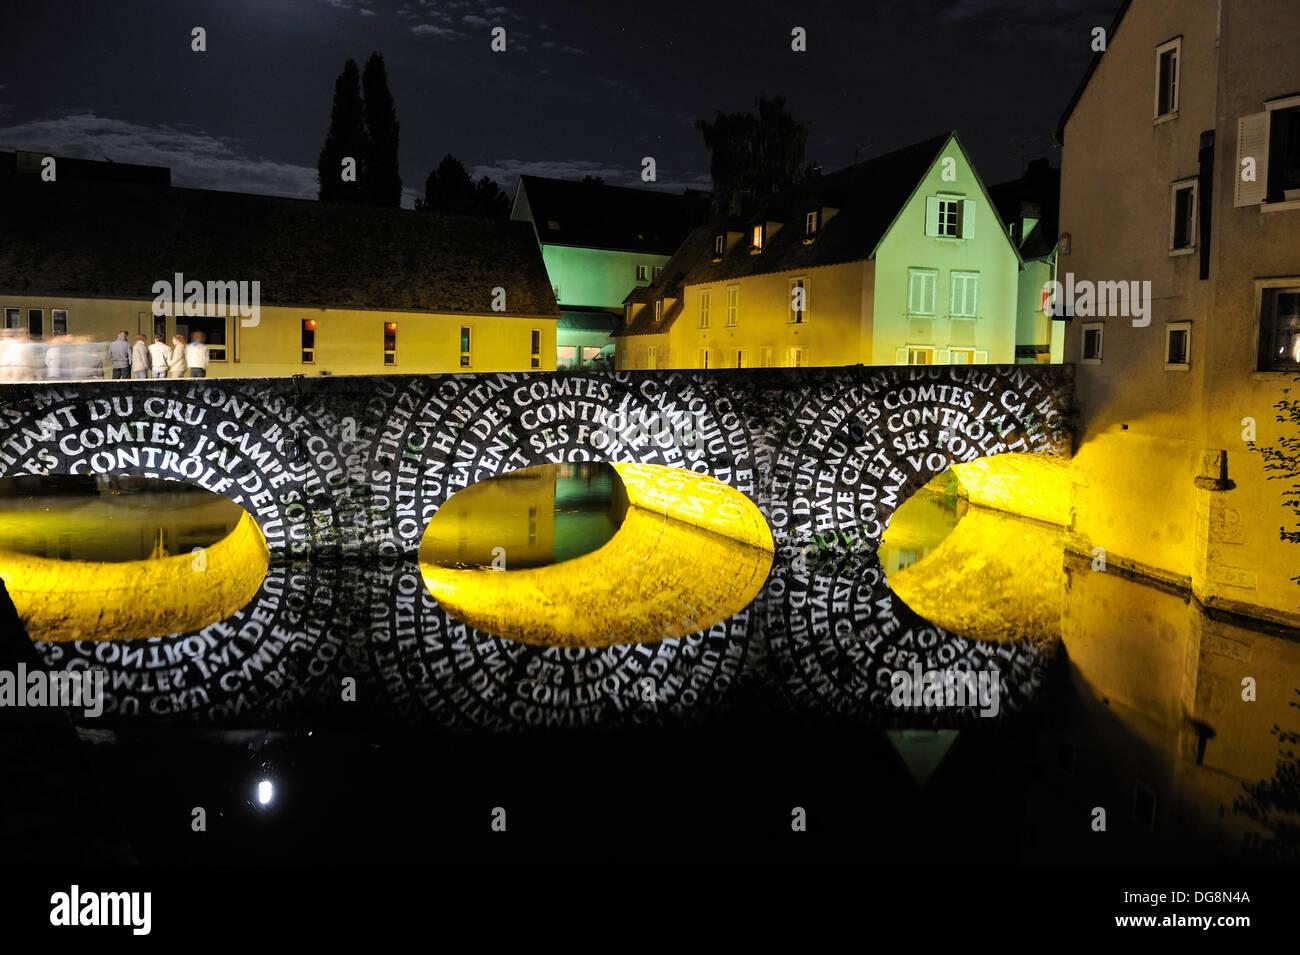 Beleuchtung des Fachbereichs Bouju Brücke, Chartres, Eure-et-Loir Region Centre, Frankreich, Europa Stockbild